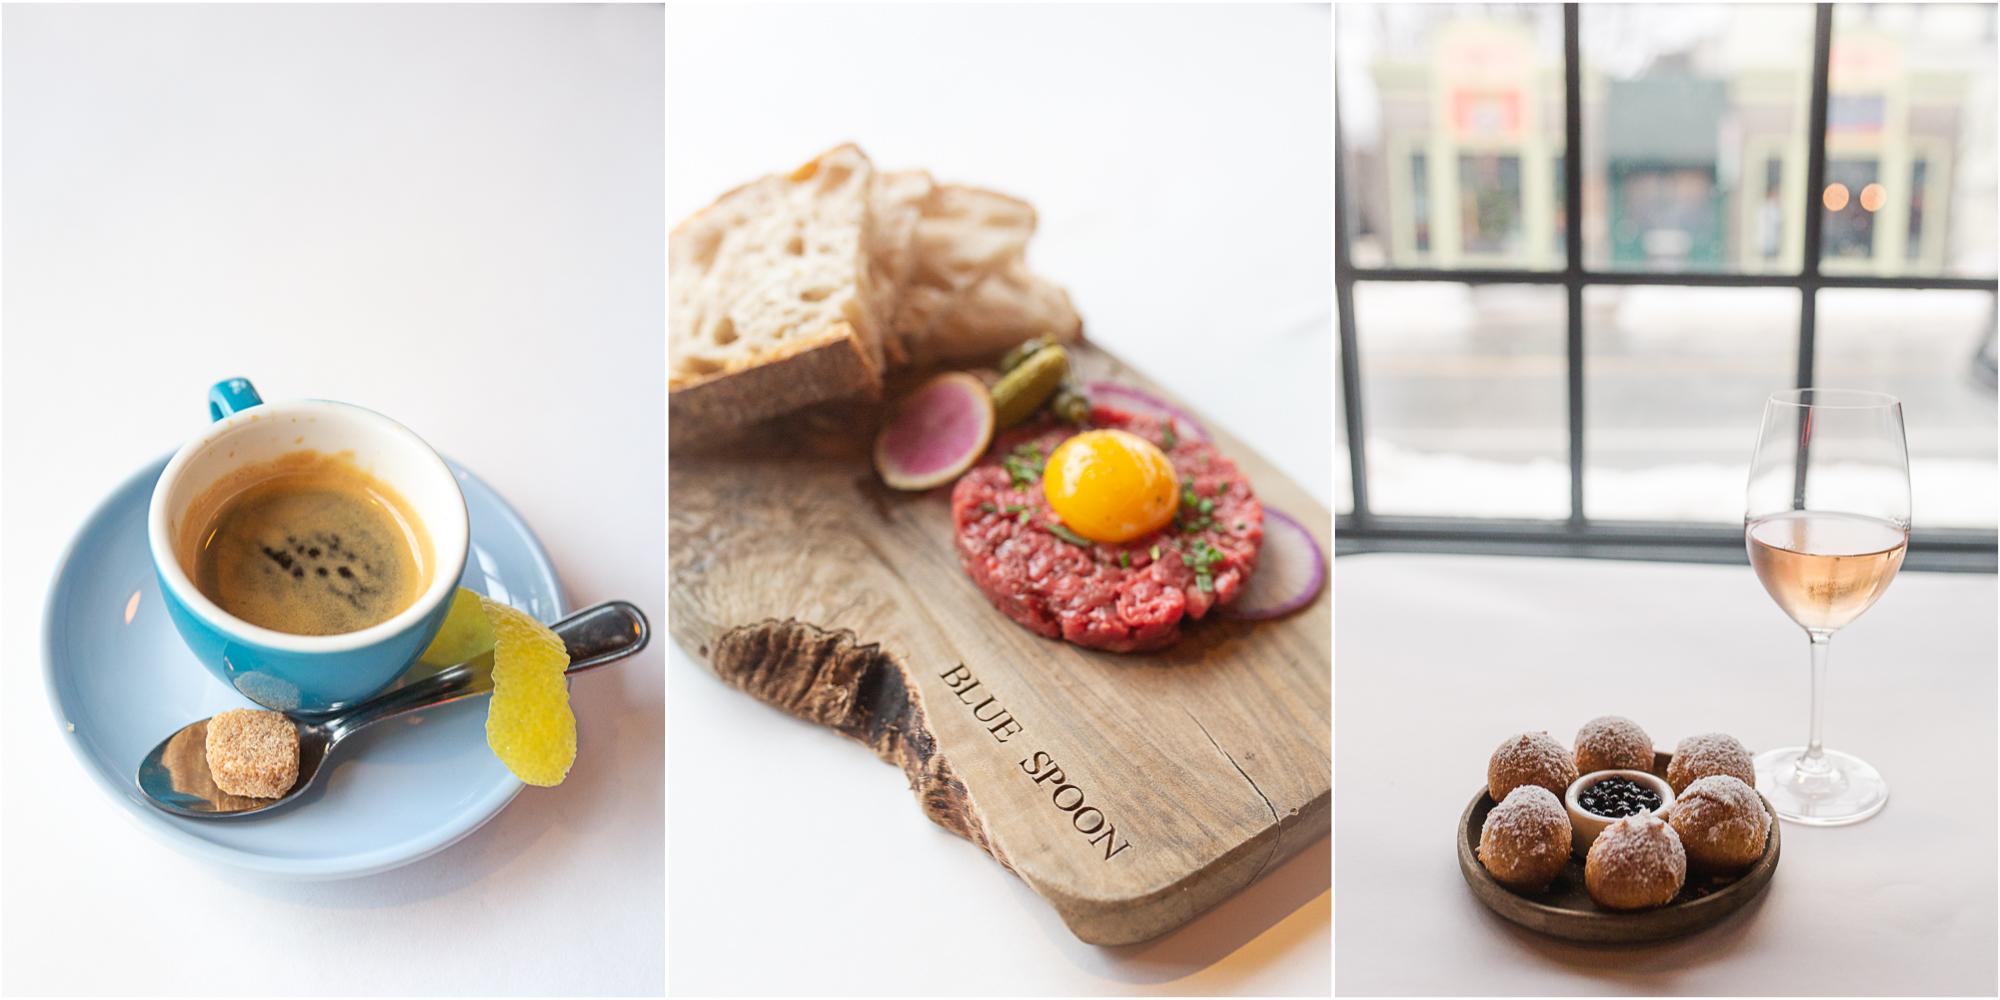 Blue Spoon, Food Photography.jpg